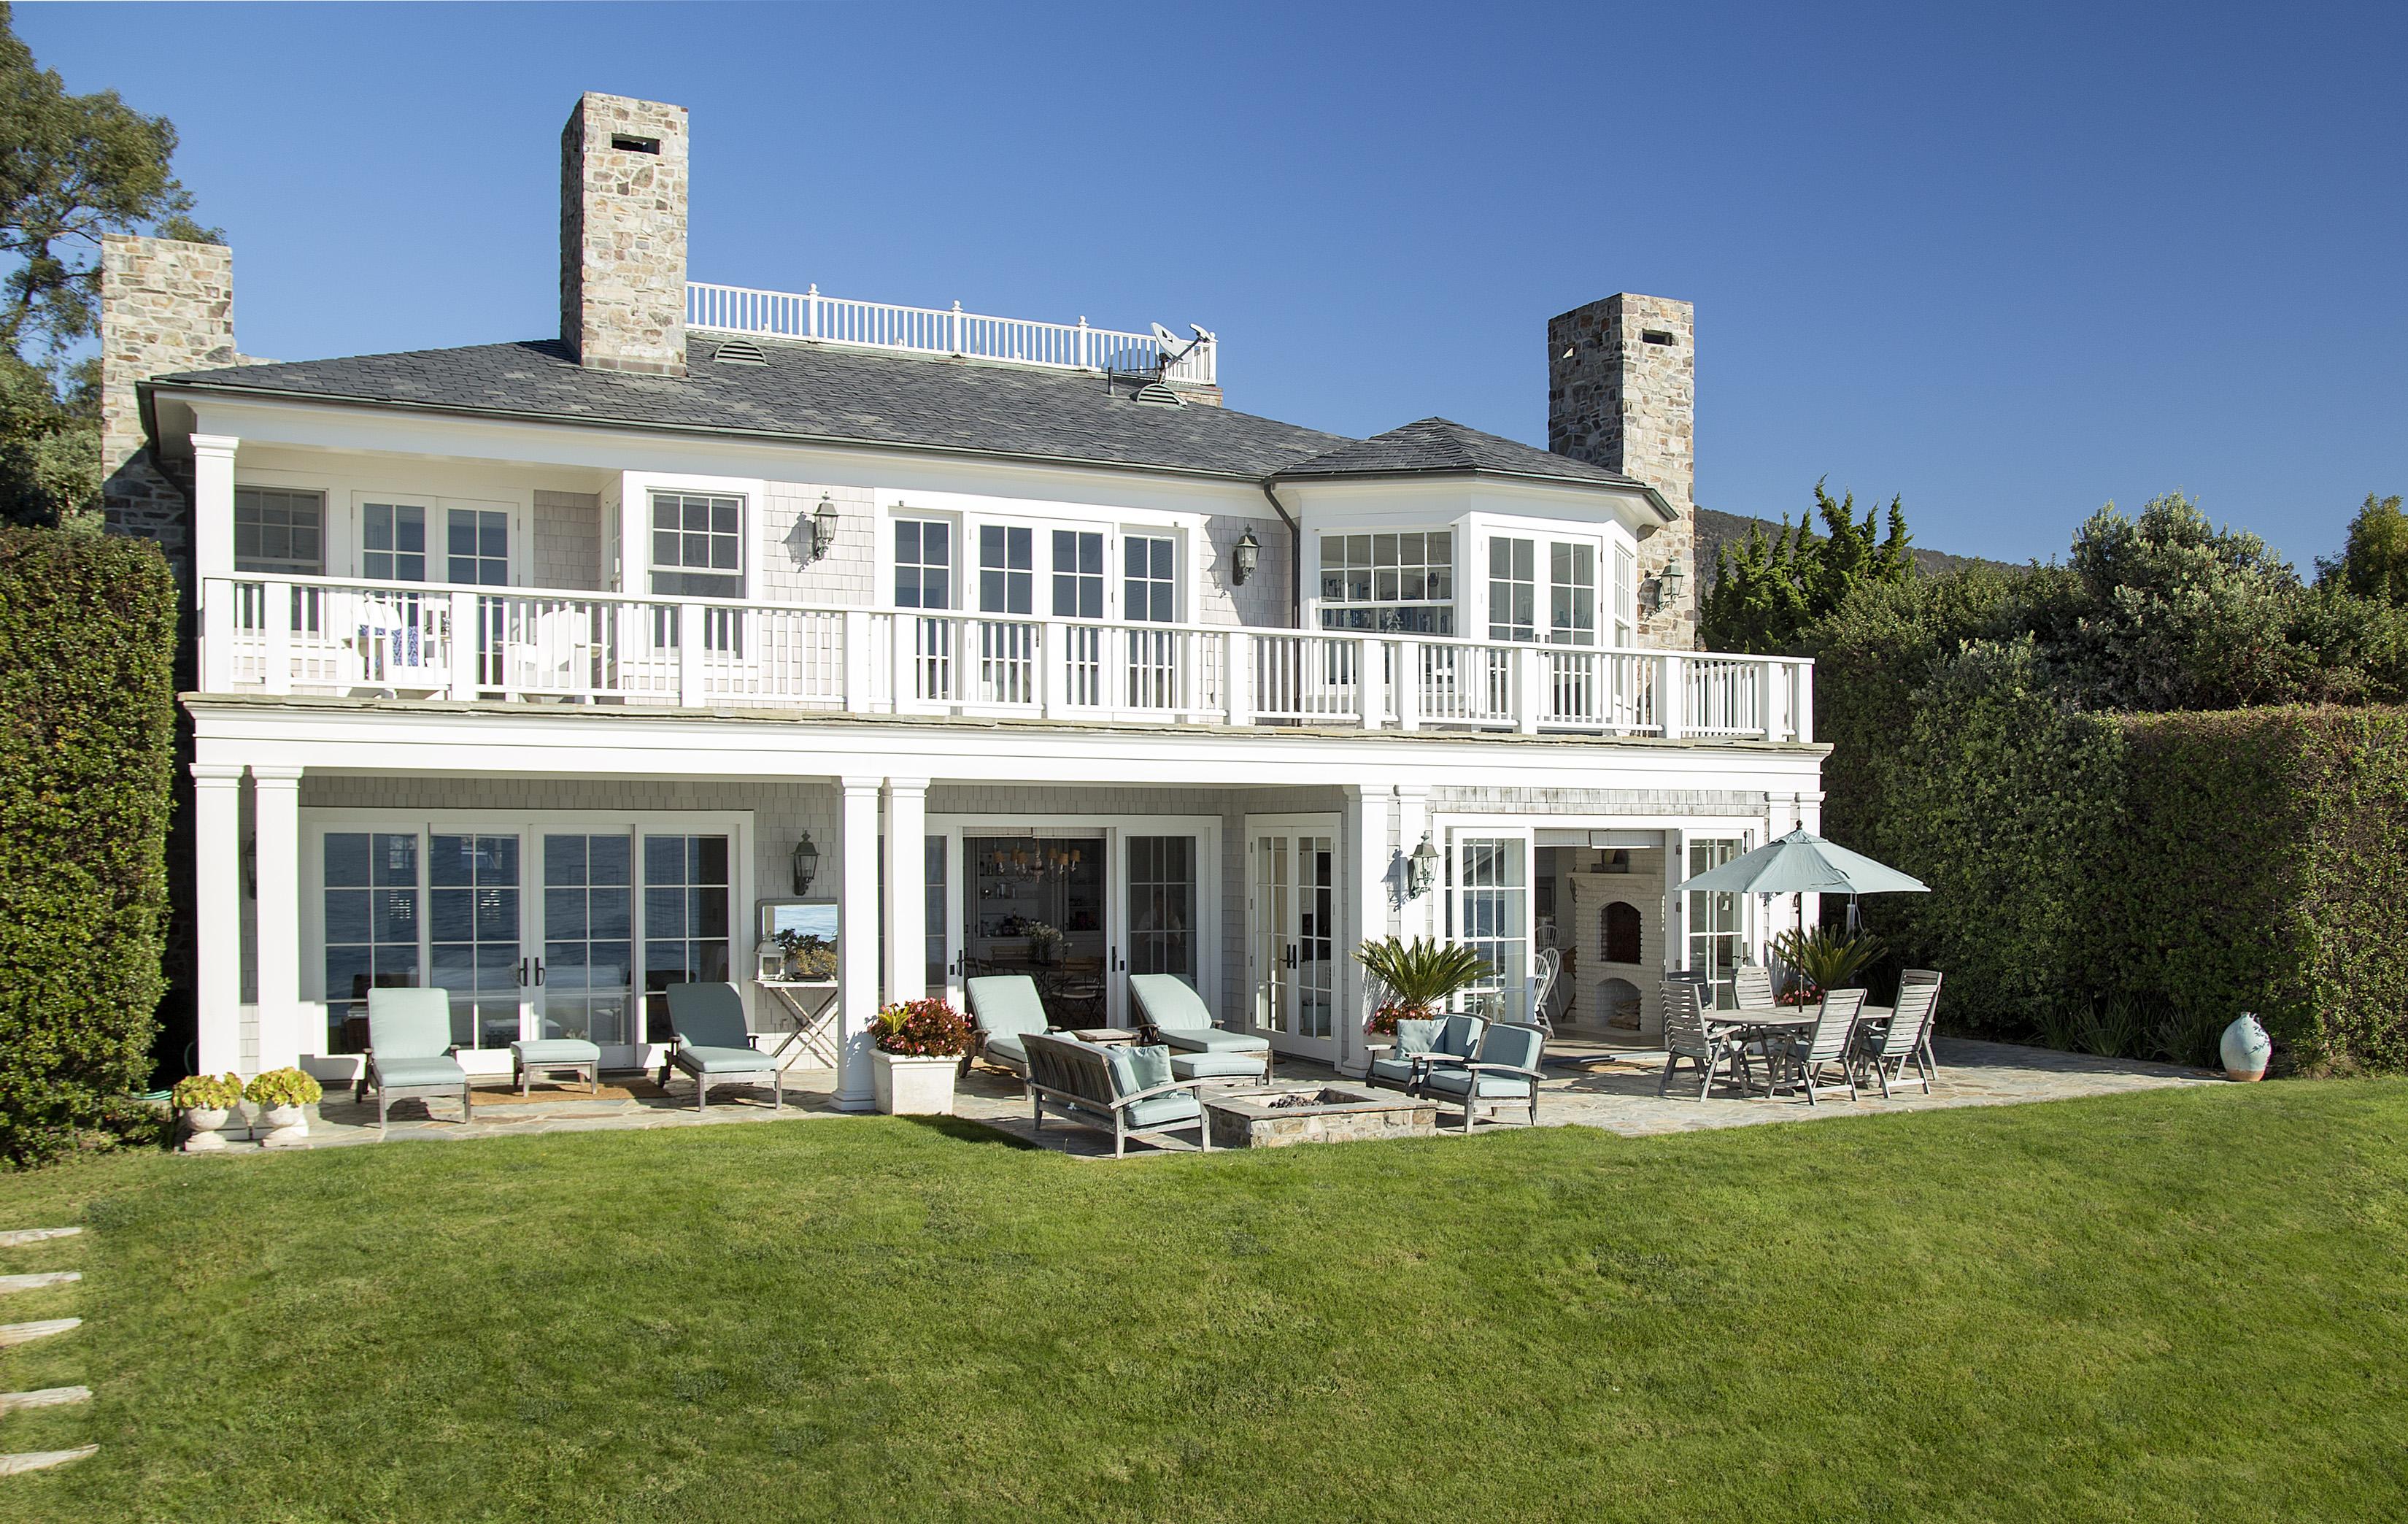 Carolyn Espley-Miller update: dennis miller sells glam beach mansion for $19m - zillow